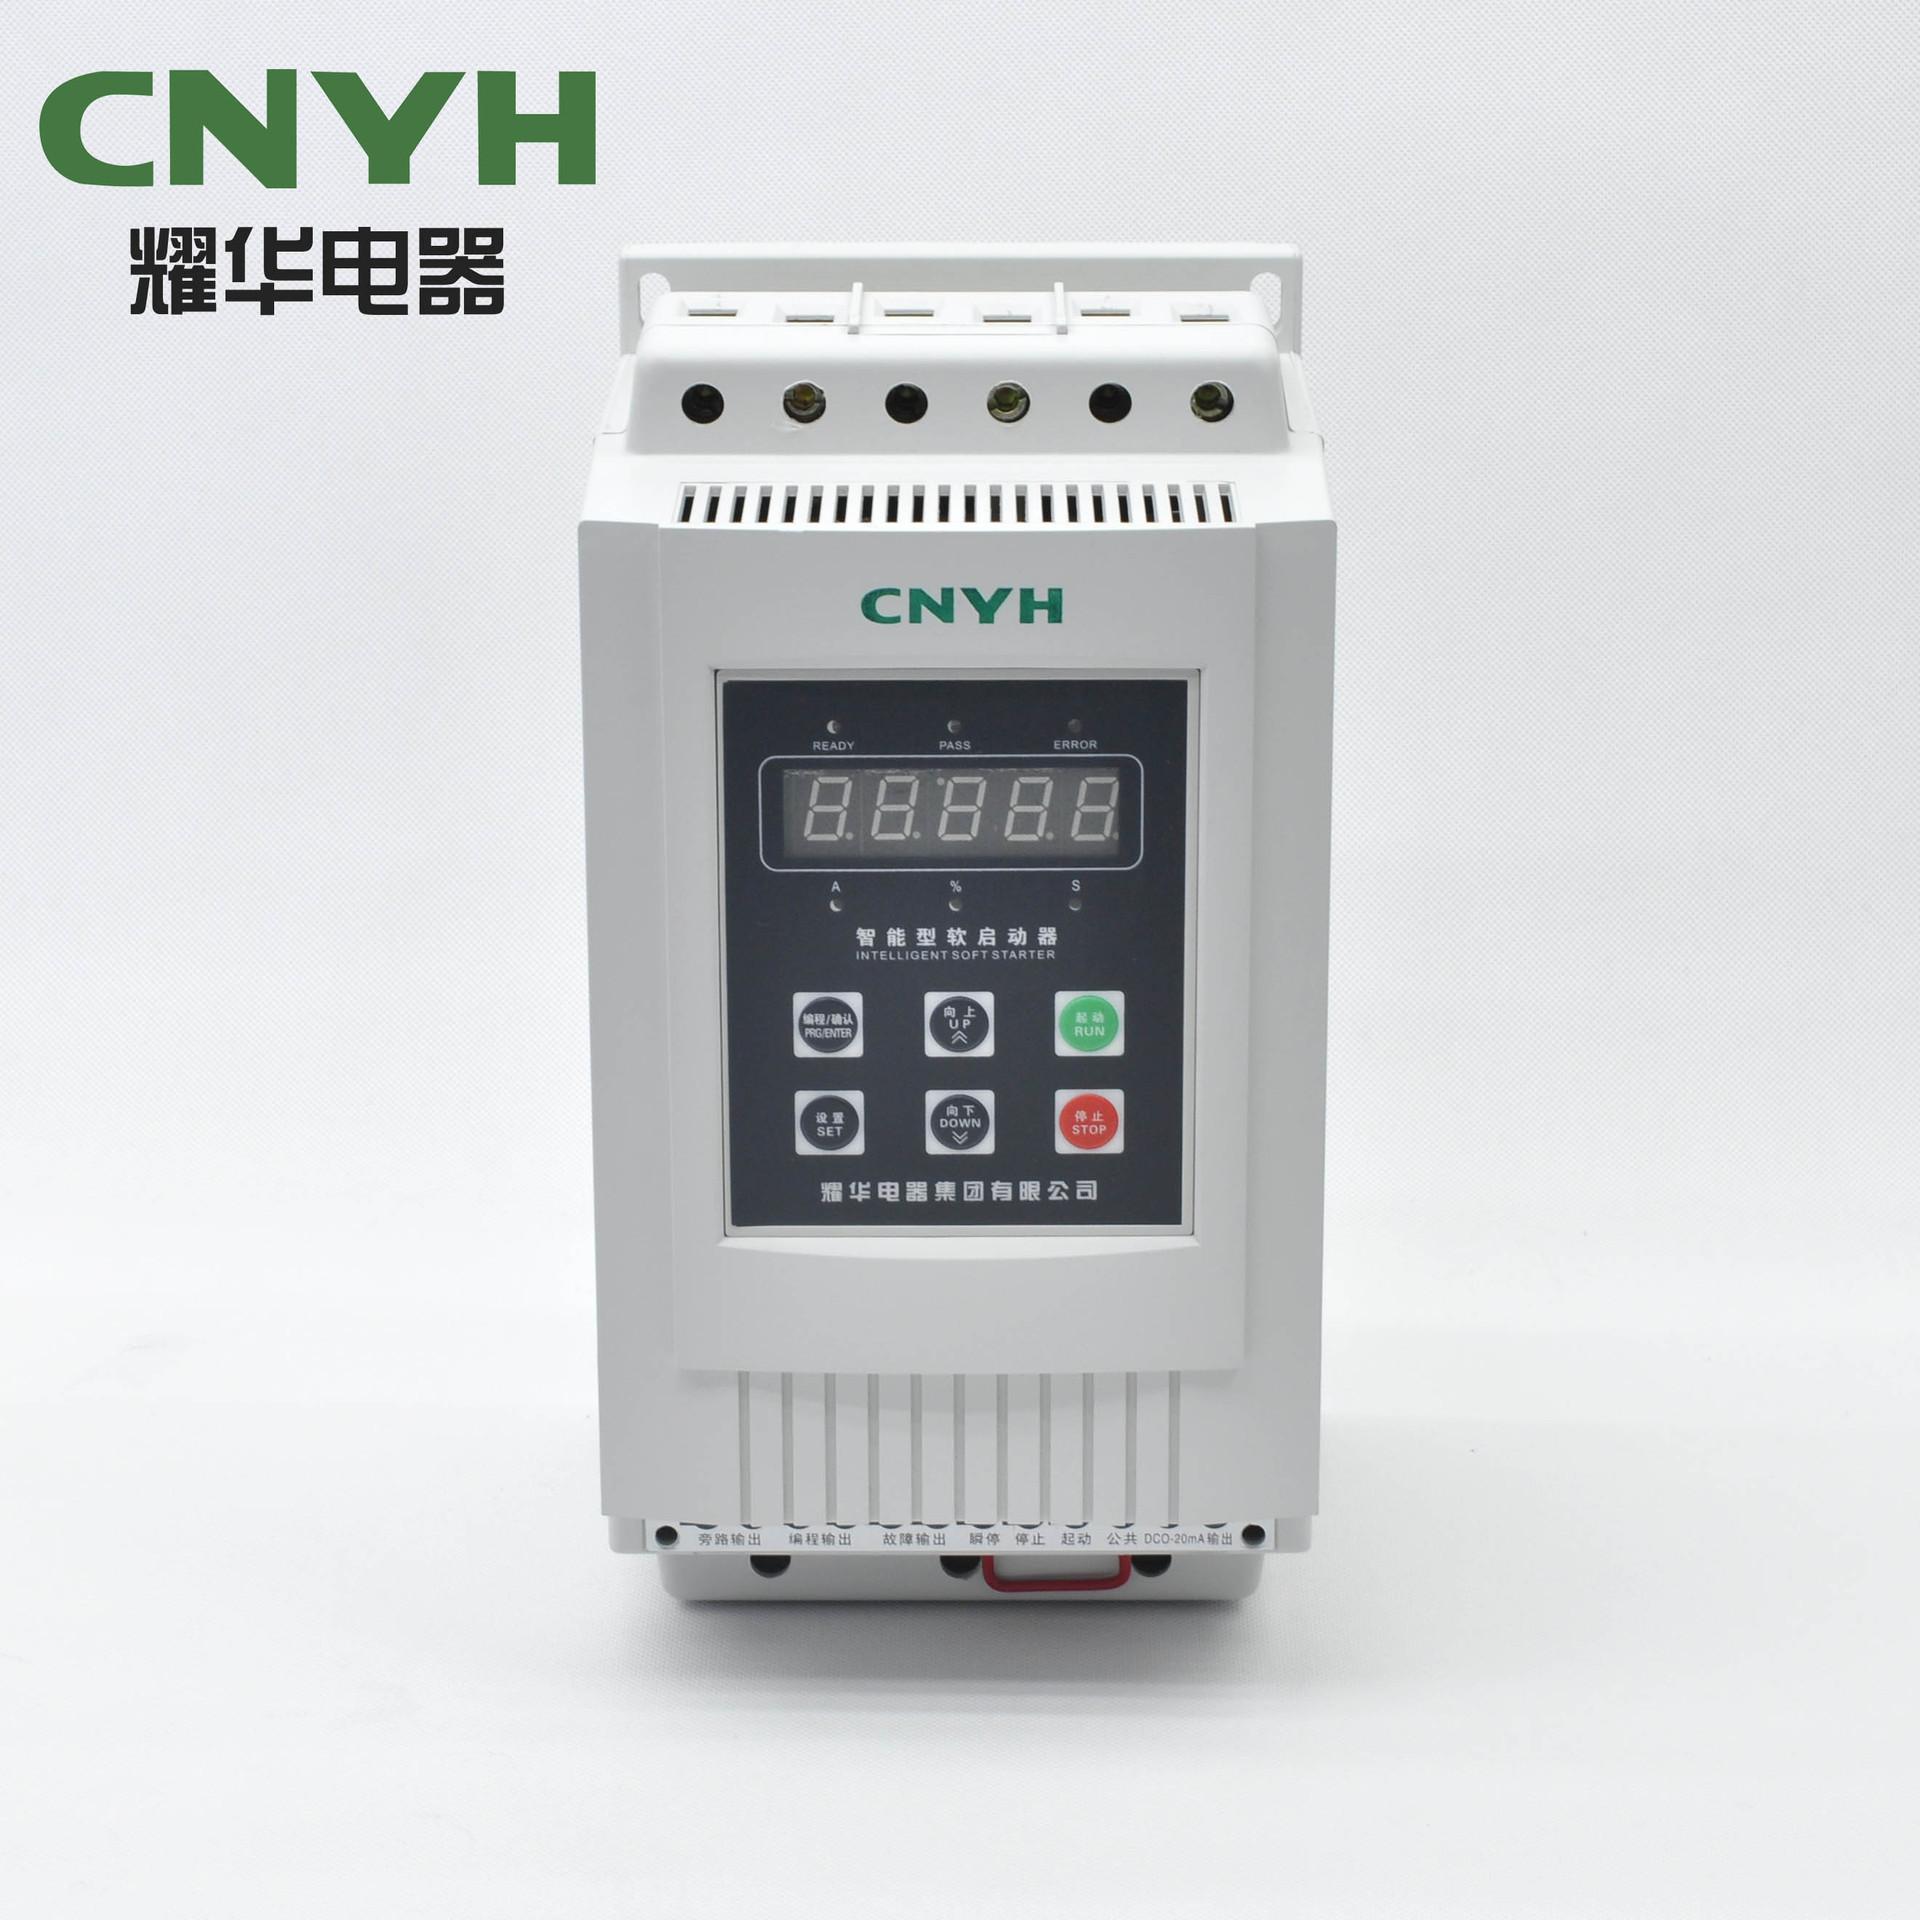 CNYH Cnyh soft starter yhr5 series 11kw 90kw soft starter of Yaohua Electric Appliance Group